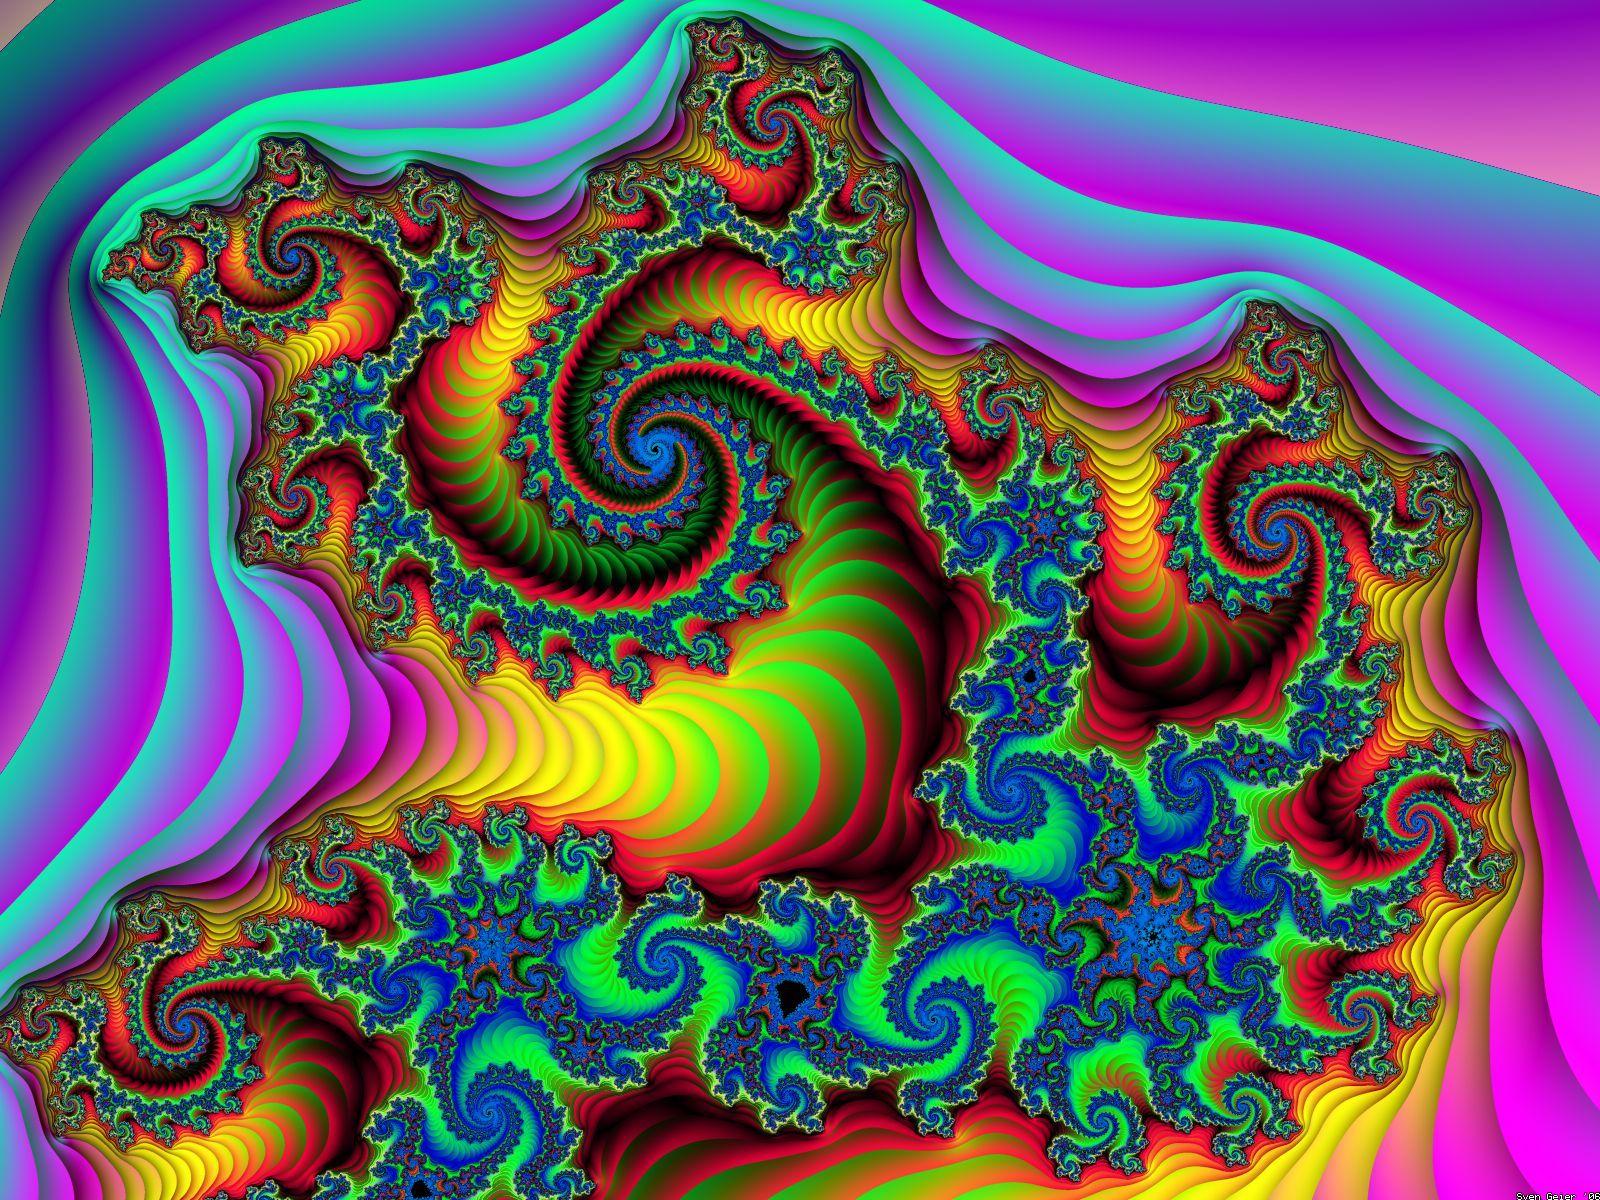 Hyperspace 3d Wallpaper The Fractal Bargain Bin Wallpapers Eye Candy Pretty